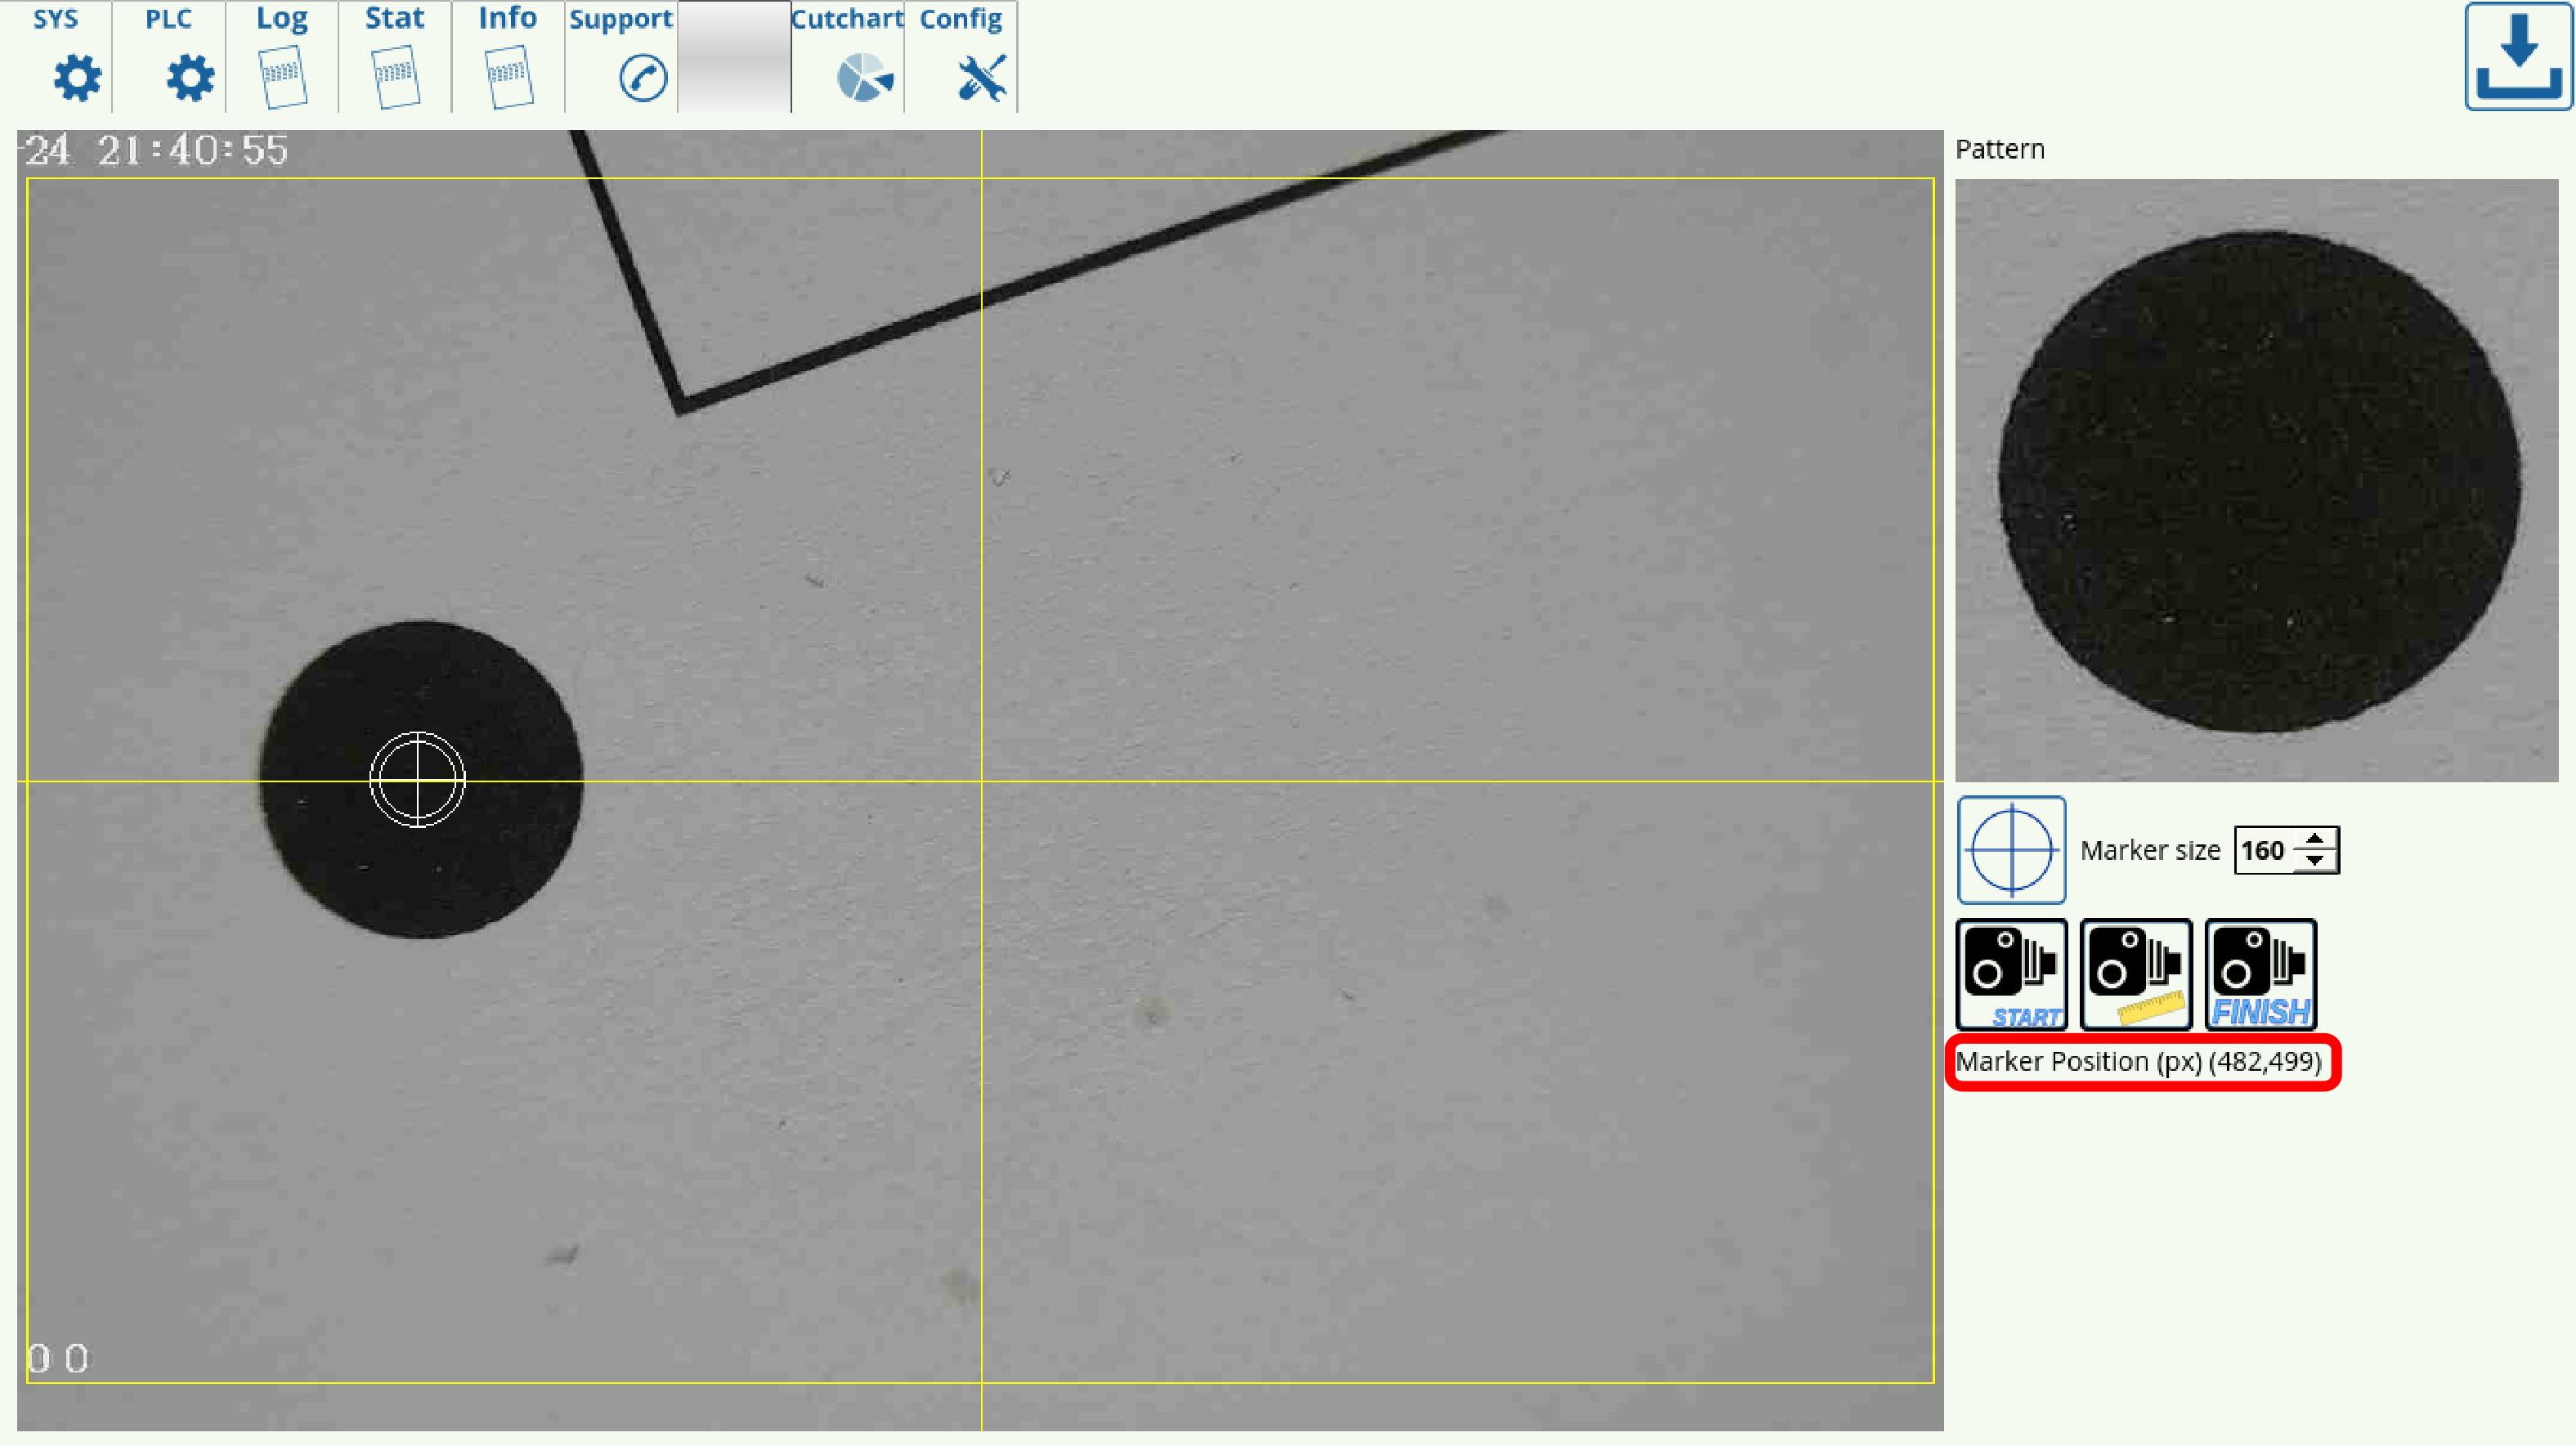 cnc-vision-008-moving.jpg